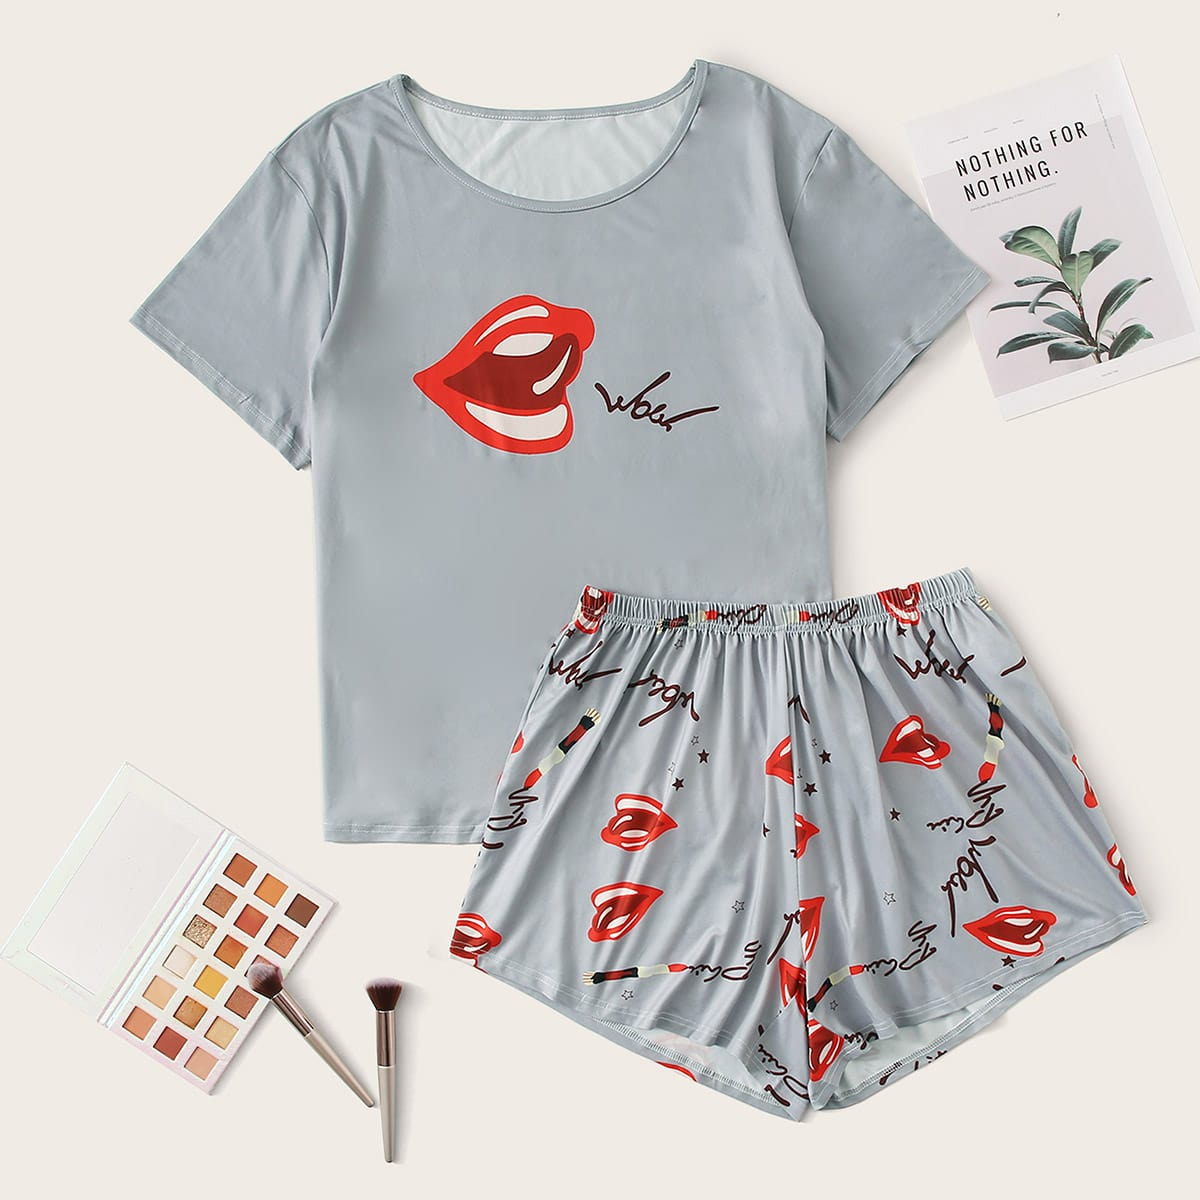 shein Casual Tekst Grote maten pyjama sets